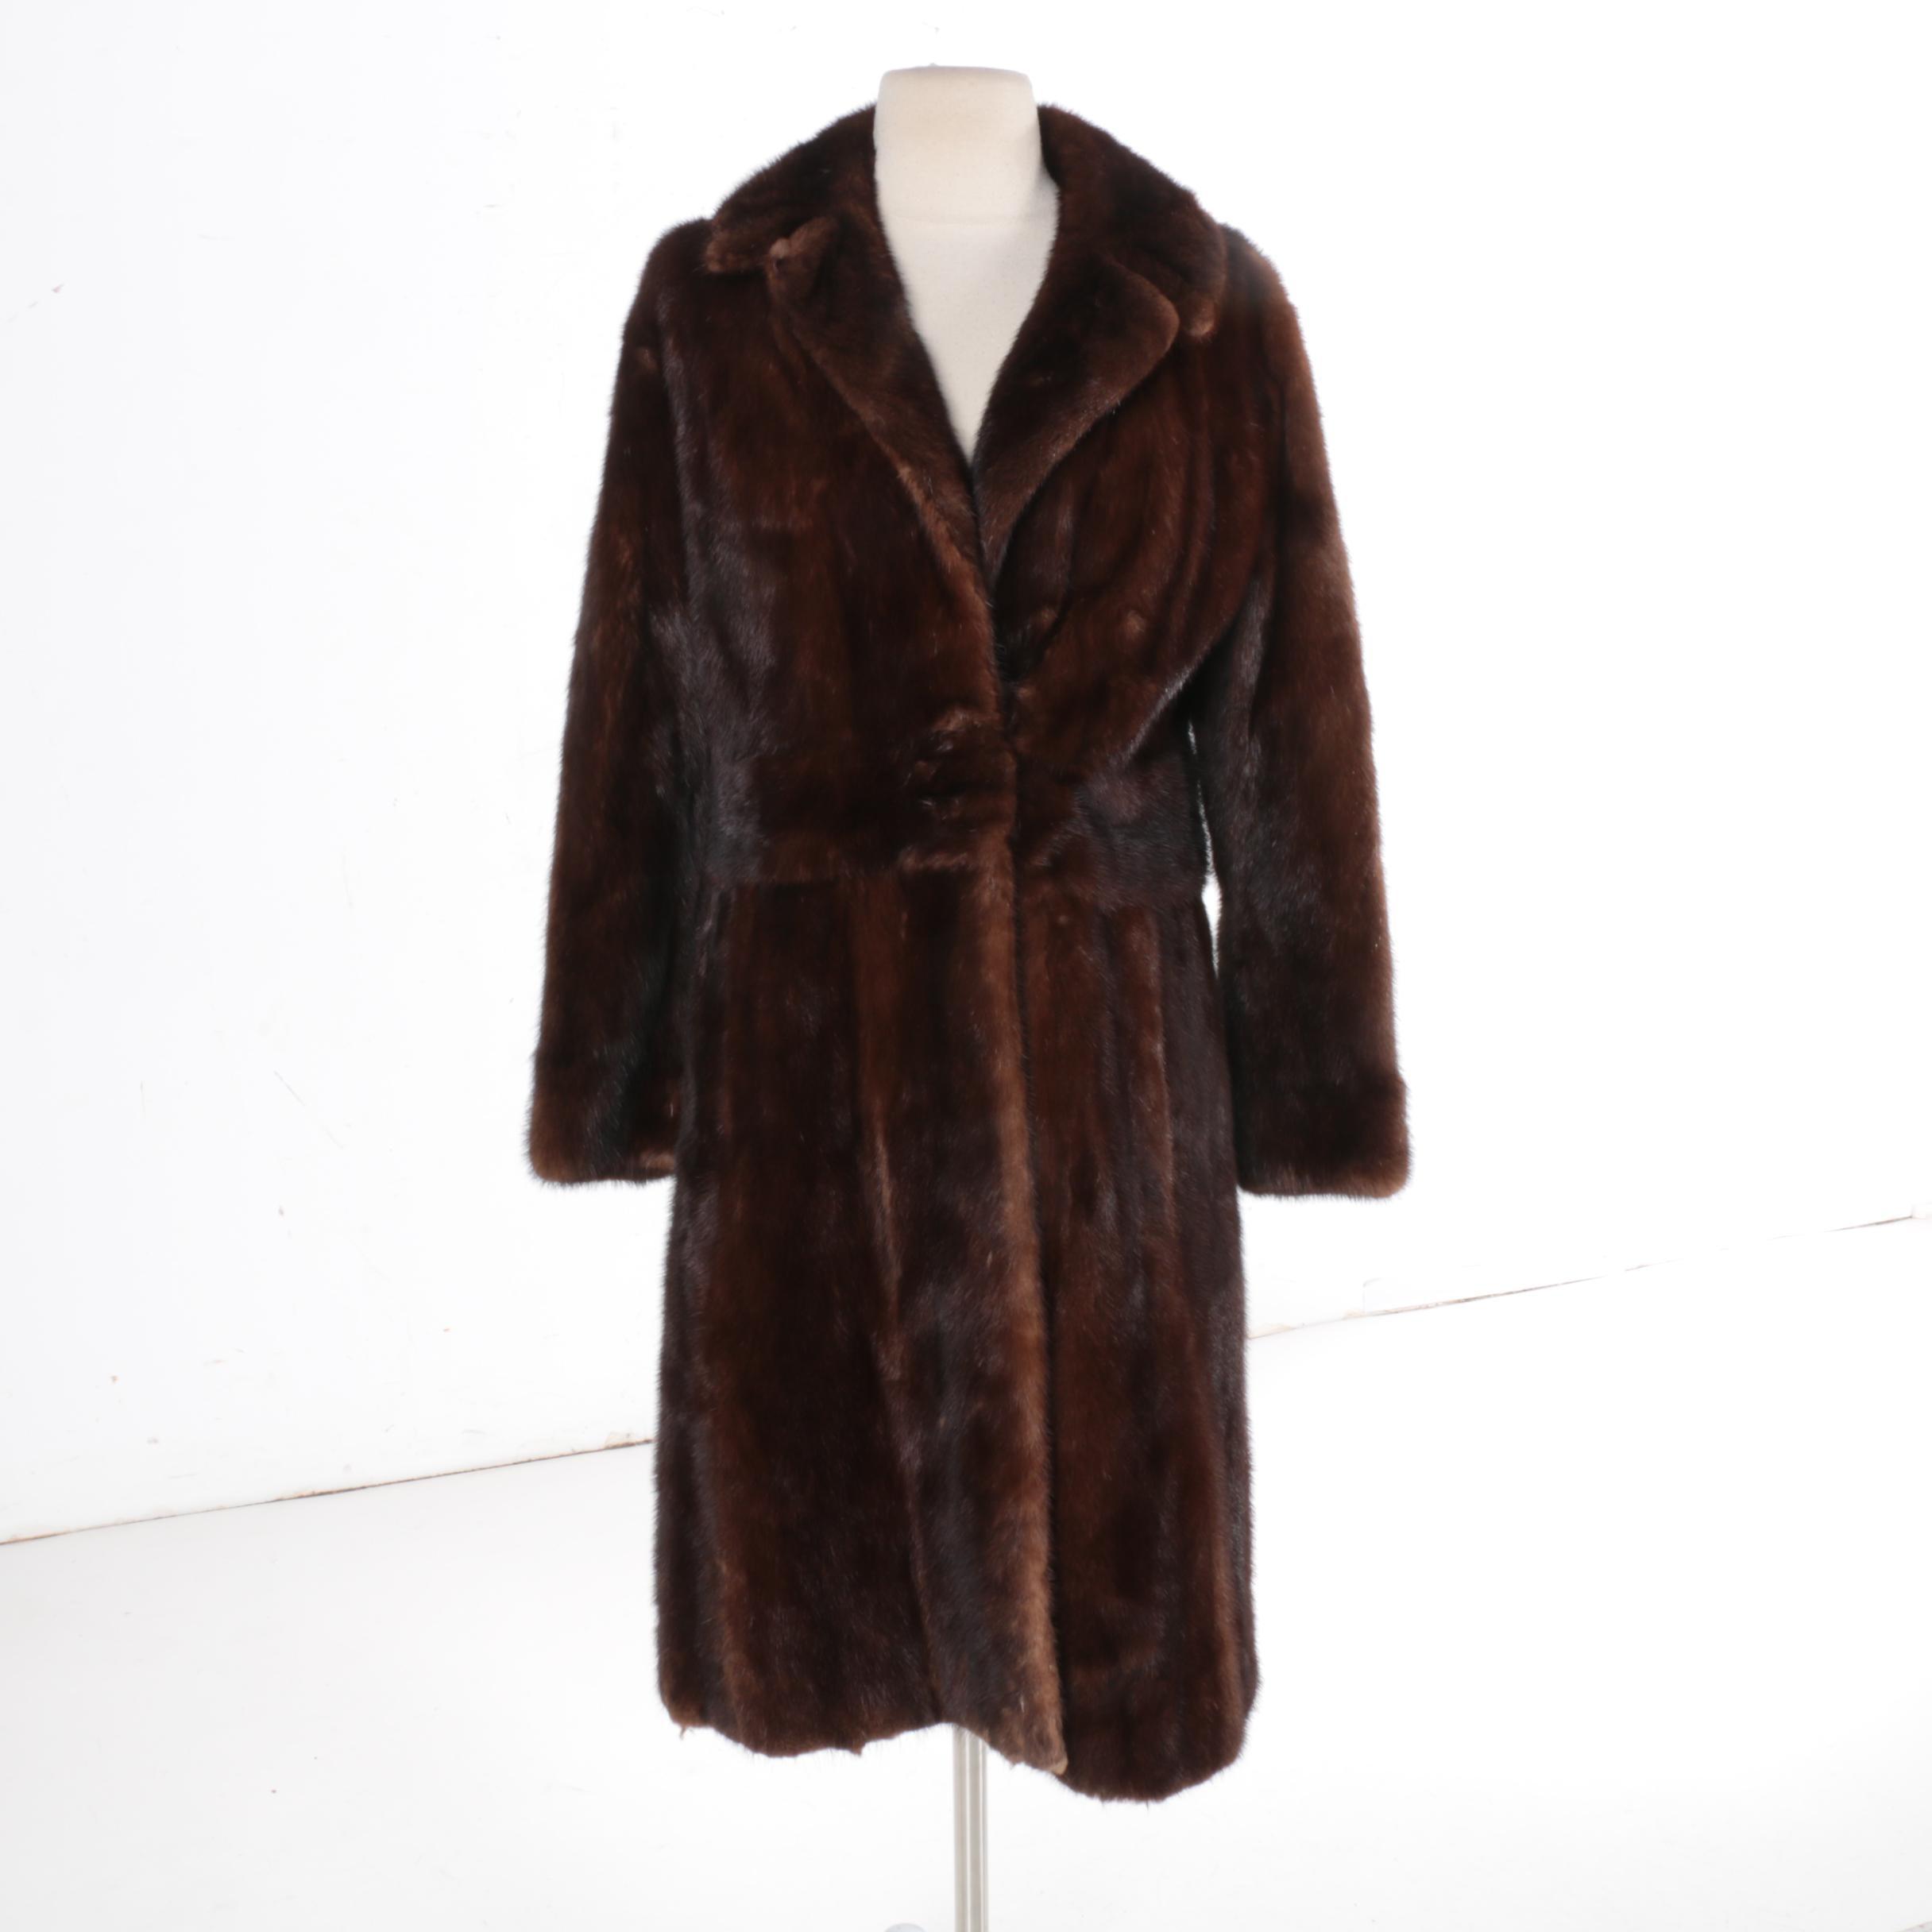 Vintage Chocolate Mink Fur Coat